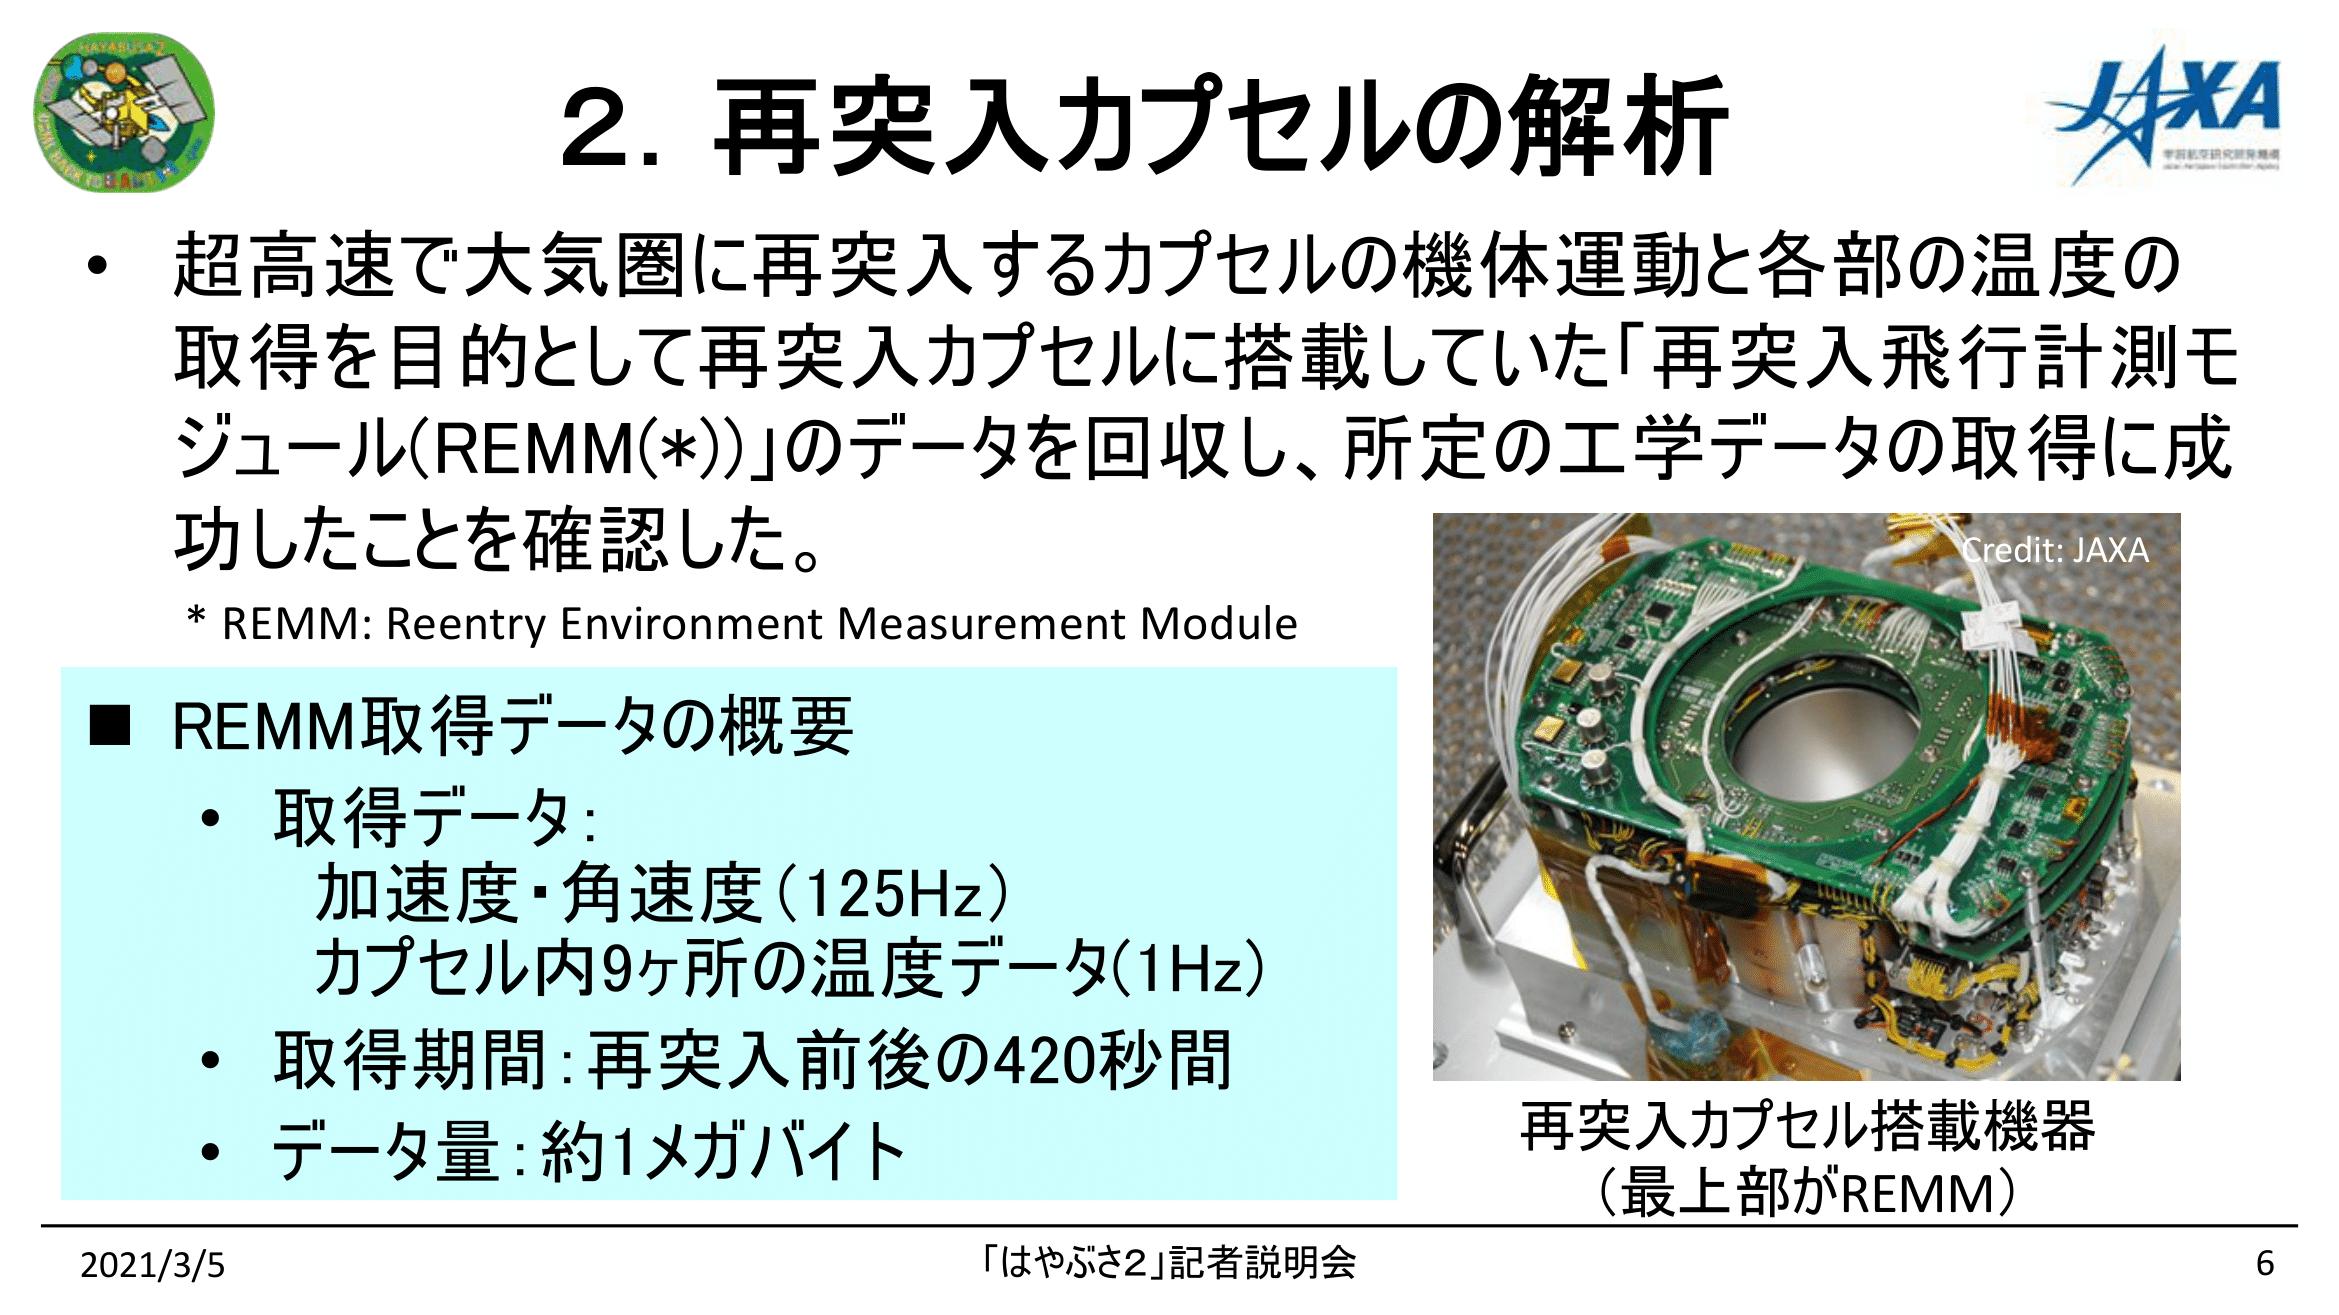 f:id:Imamura:20210305134054p:plain